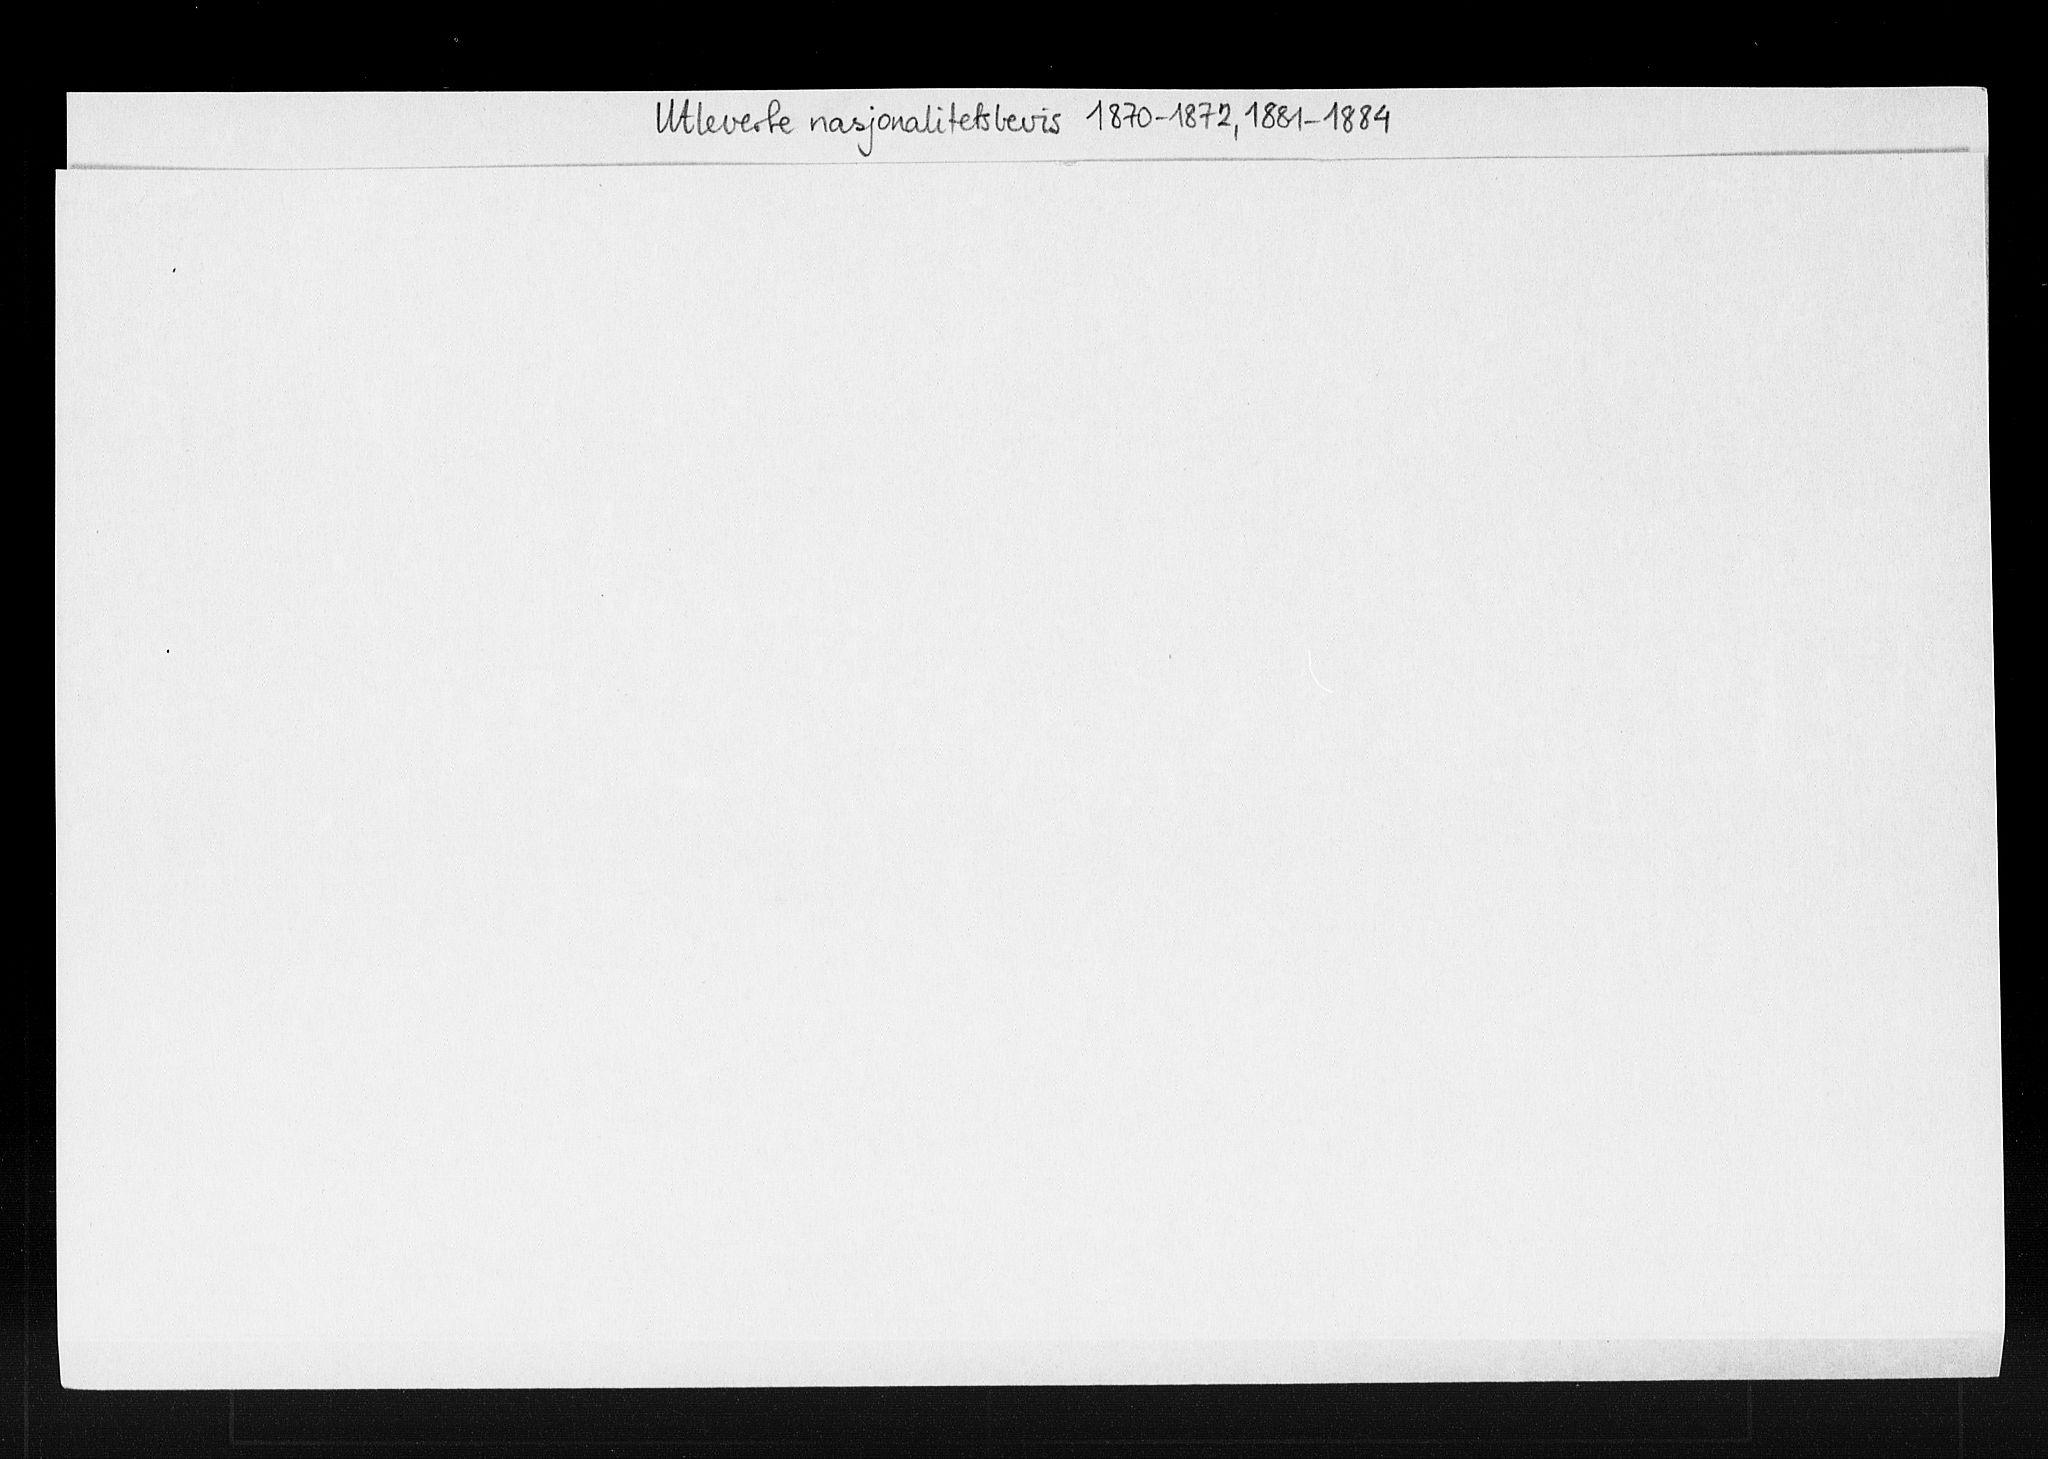 SAK, Lillesand tollsted, H/Ha/L0433: Skipsregister, skipsmatrikkel, 1861-1969, s. 250